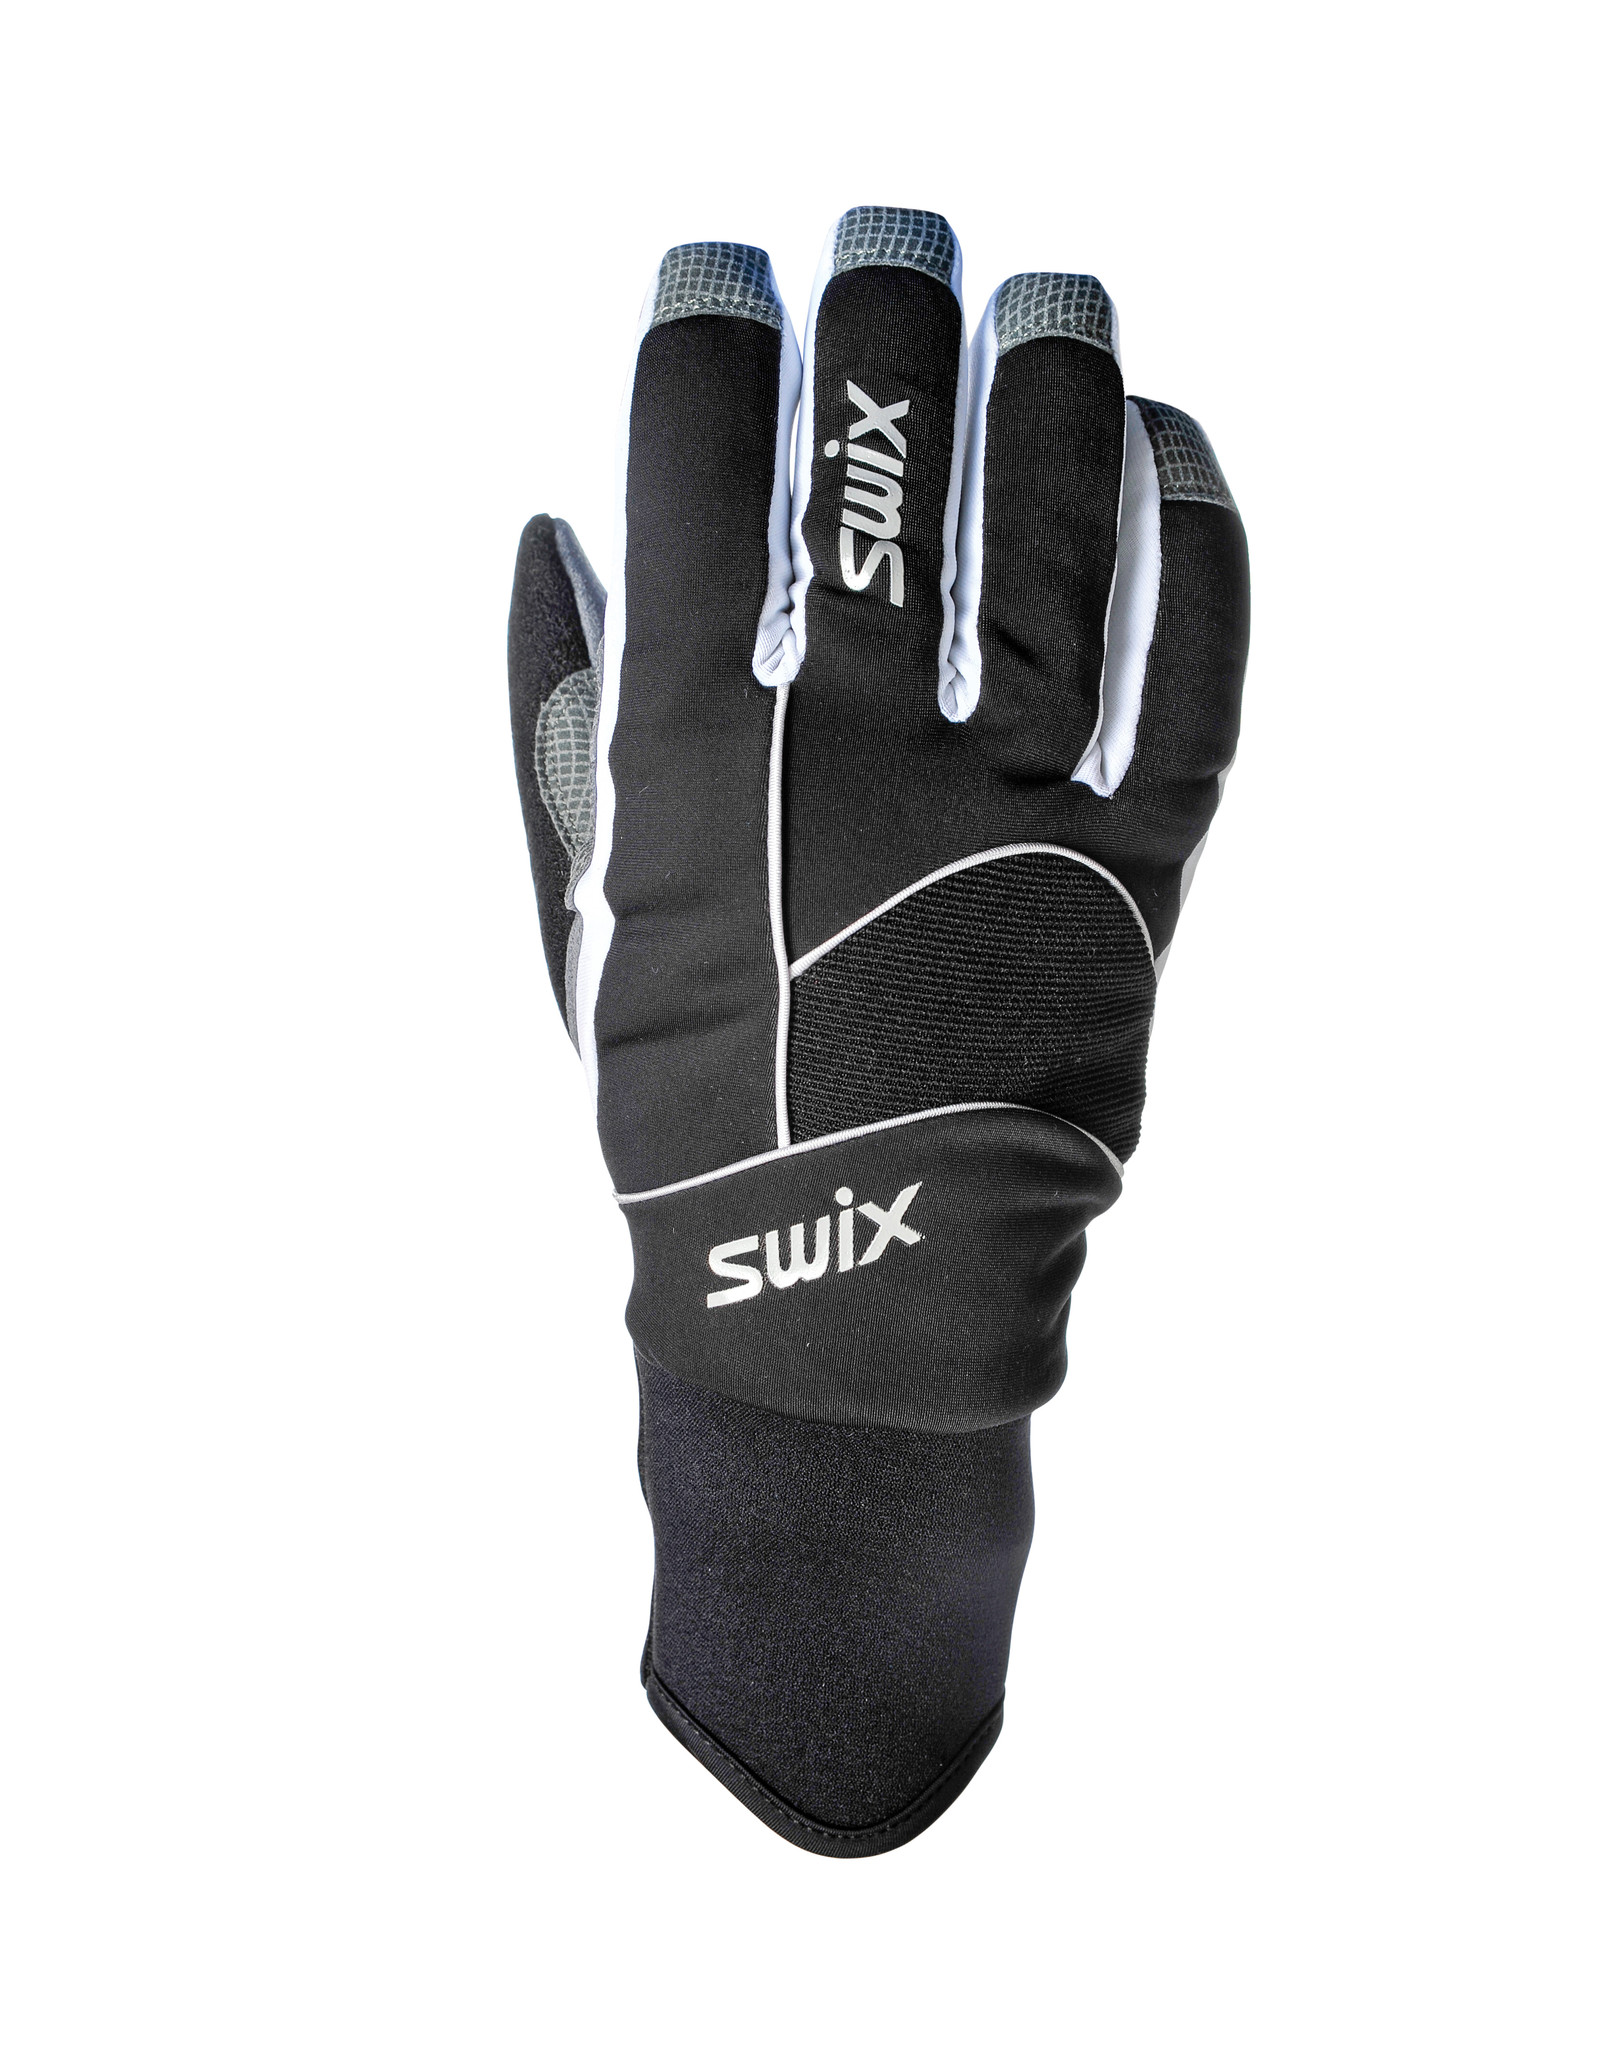 Swix Men's Star XC 2.0 Glove